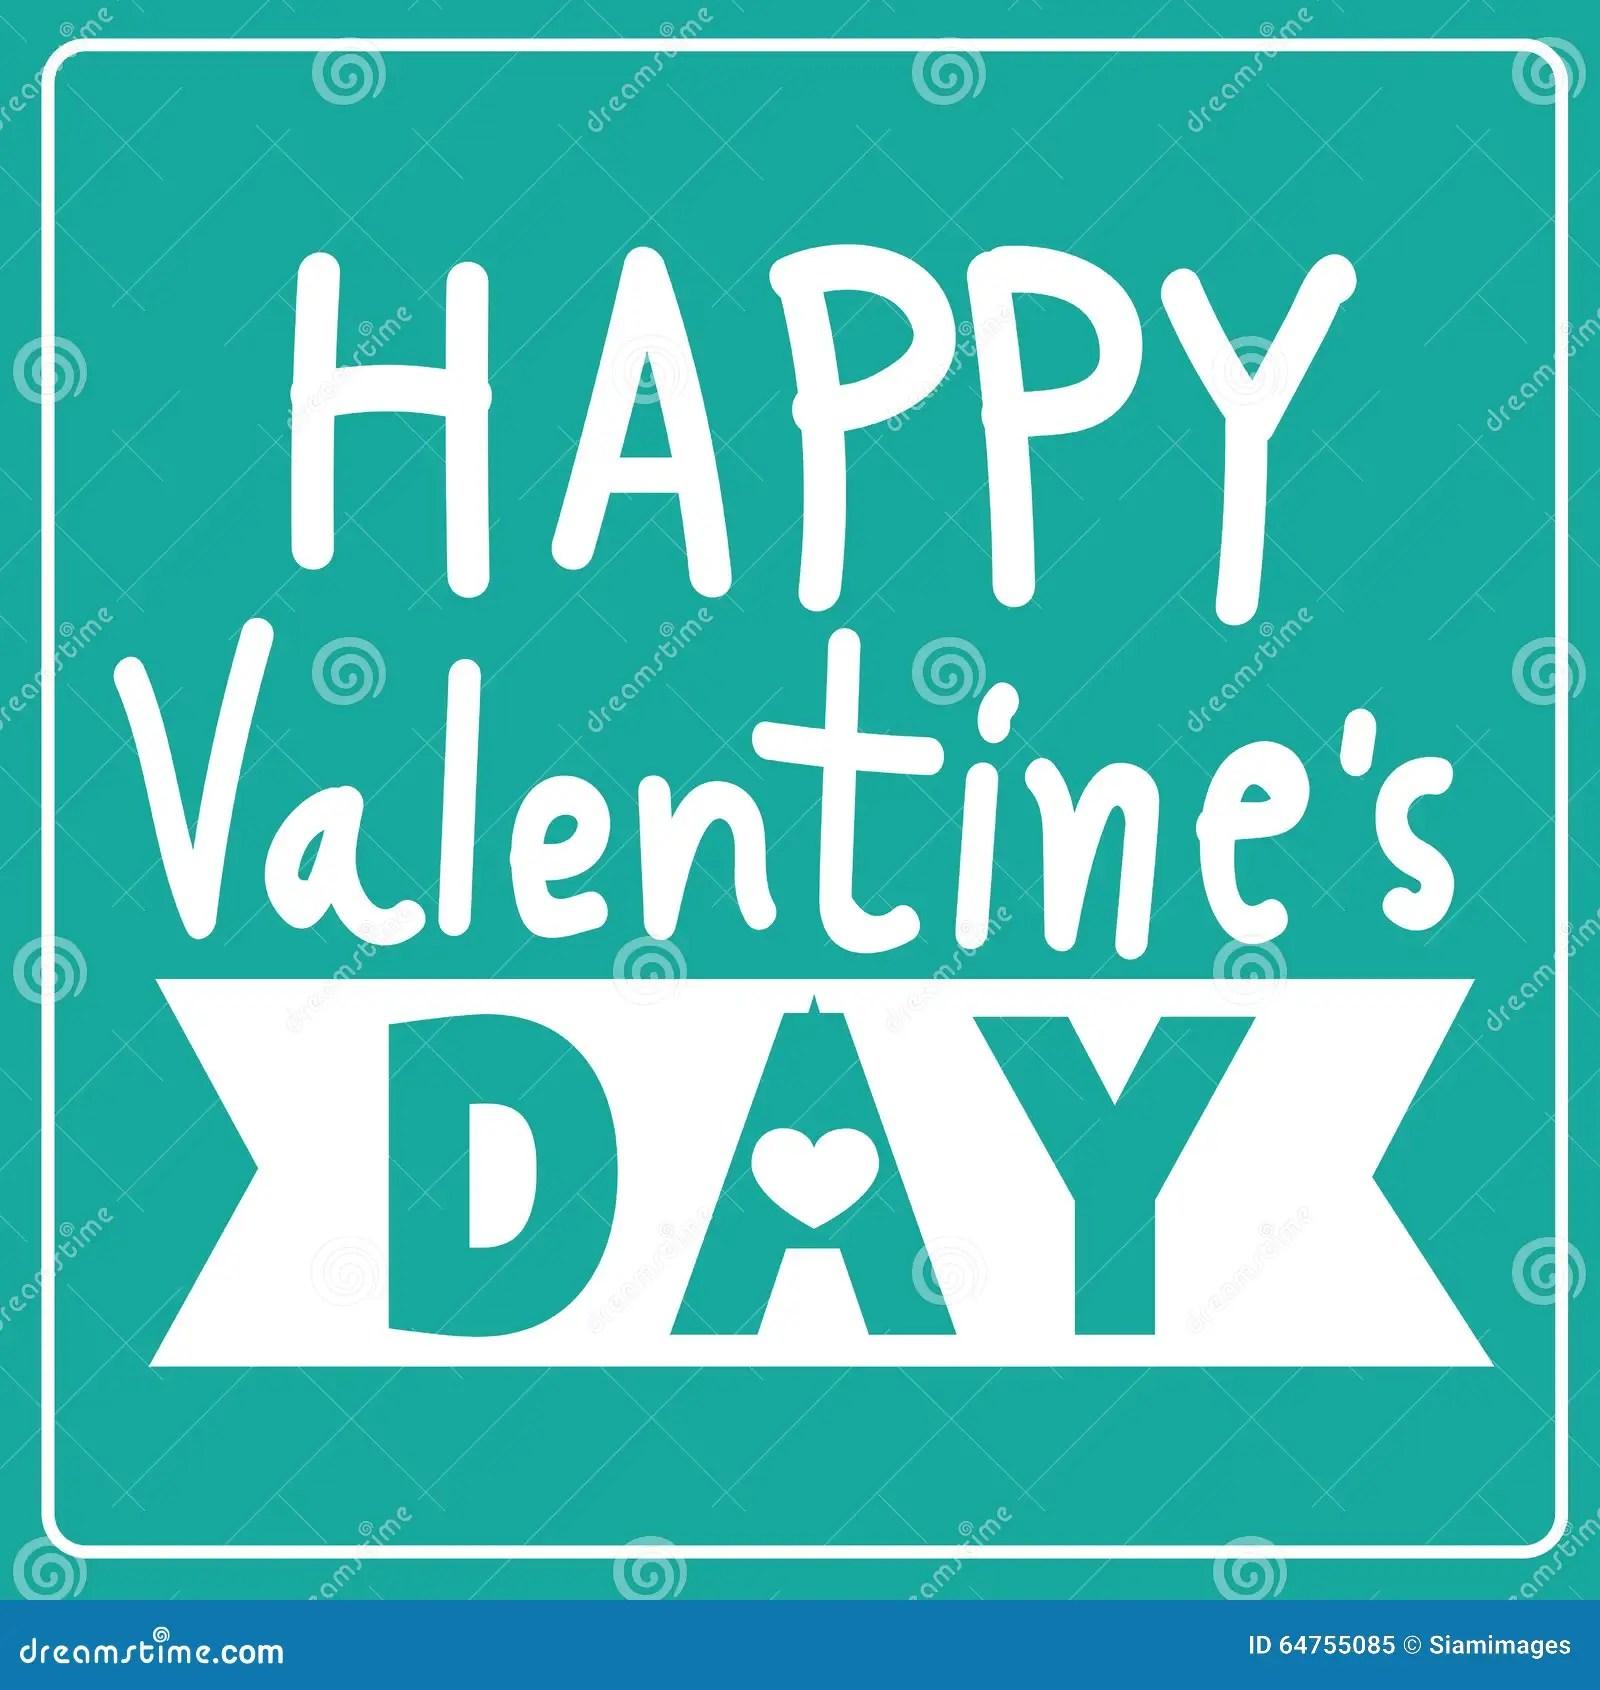 Download Happy Valentines Day Cards , Valentine, Love, Valentines Day Stock  Vector - Illustration